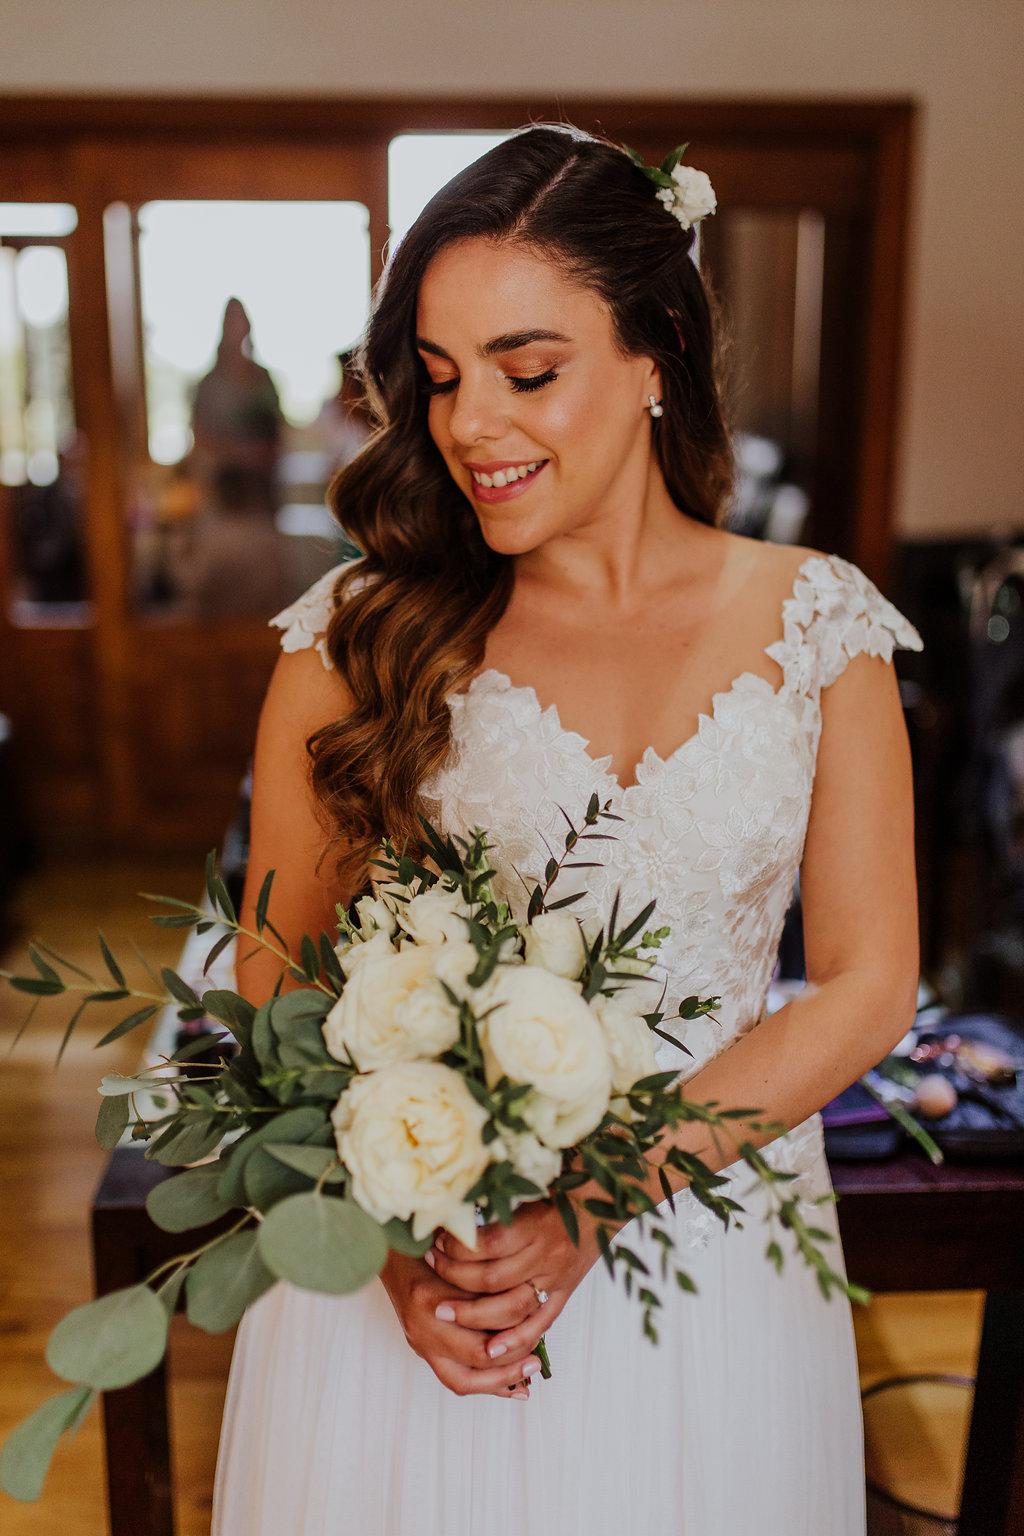 julieth-bravo-wedding-planner-matrimonio-cristiano-brunch-boda-destino-venezuela-pereira-bogotoa.matrimonio-bouquet-novia-hondas-pelo-laurapantoja-maquillale-alexrivera-diseñadora.jpg